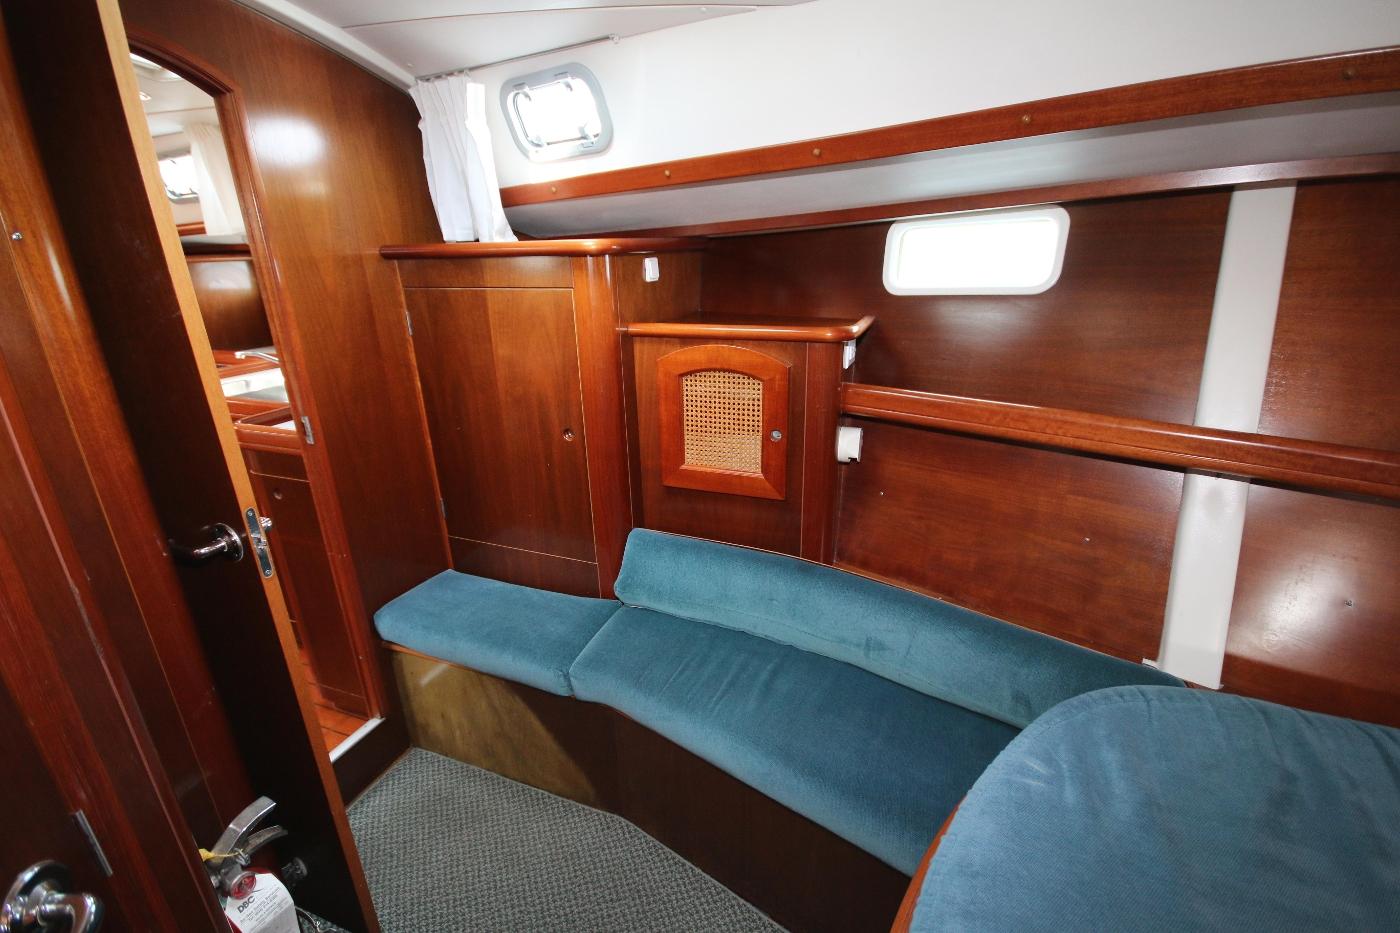 1997 Beneteau Oceanis 461, V-Berth settee & hanging locker